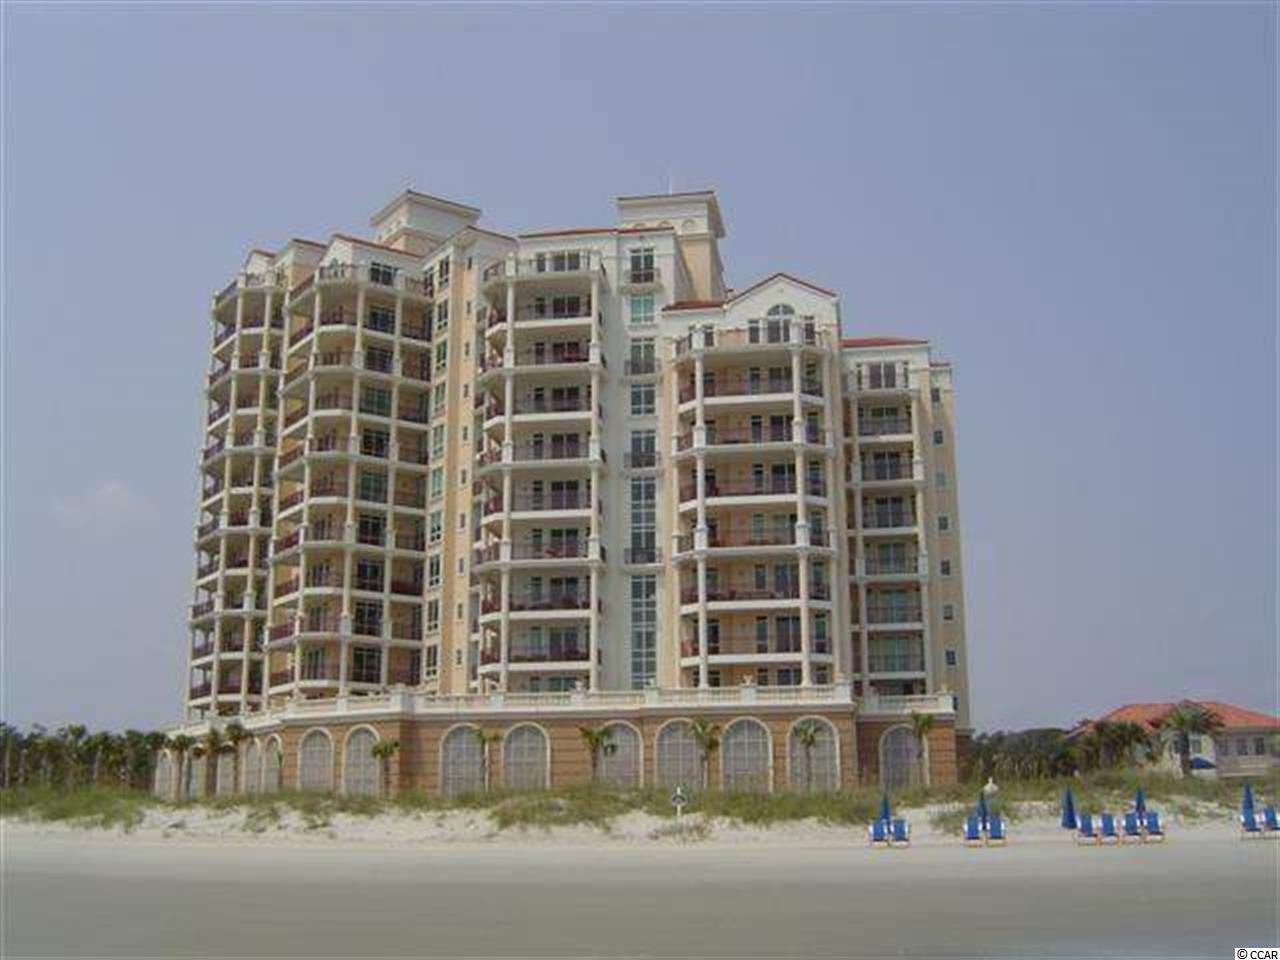 122 Vista Del Mar Ln. UNIT 2-201 Myrtle Beach, SC 29572